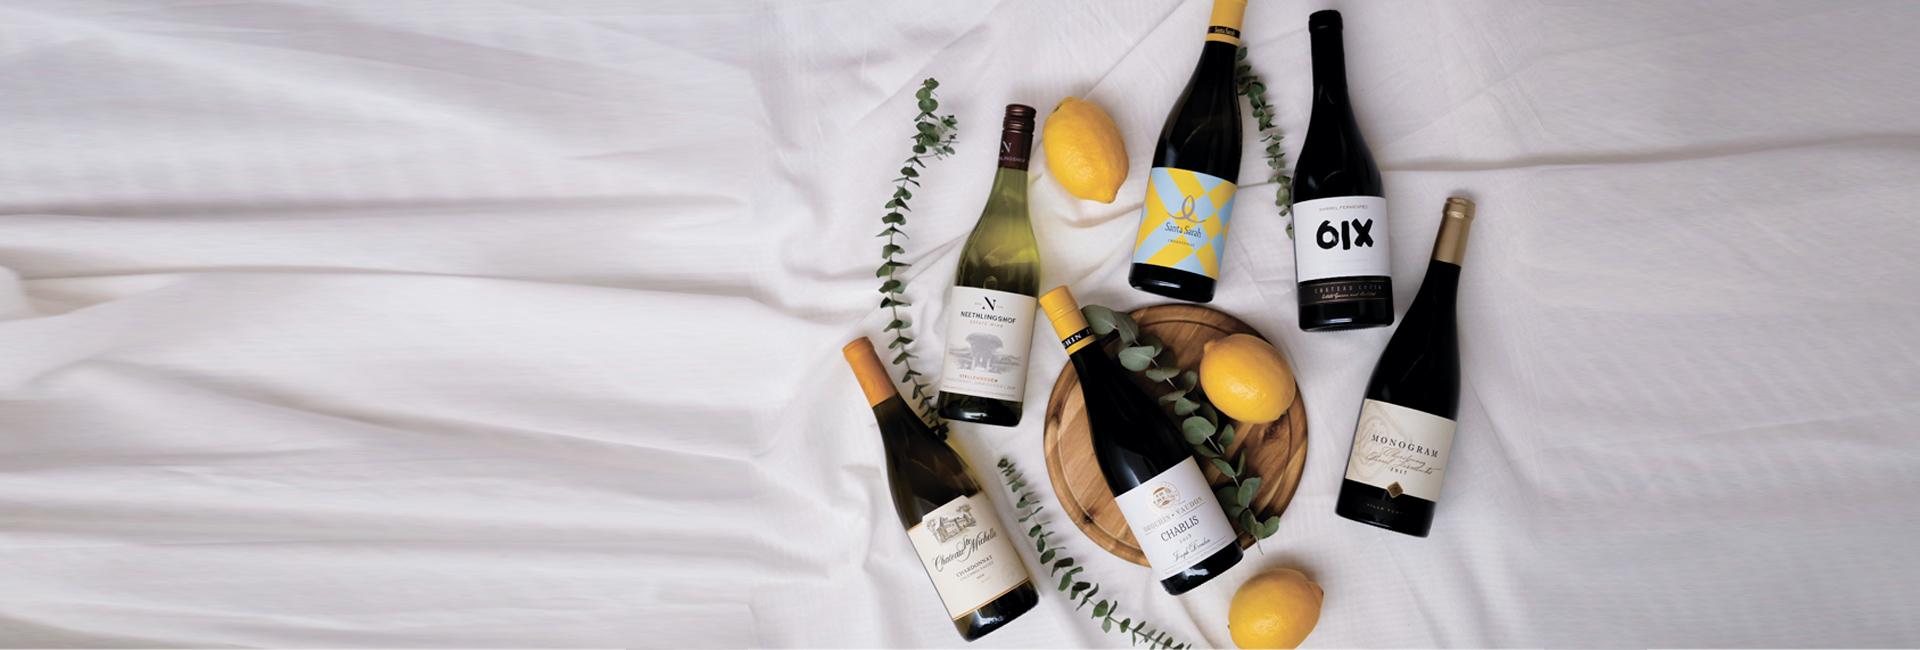 casavino promo chardonnay